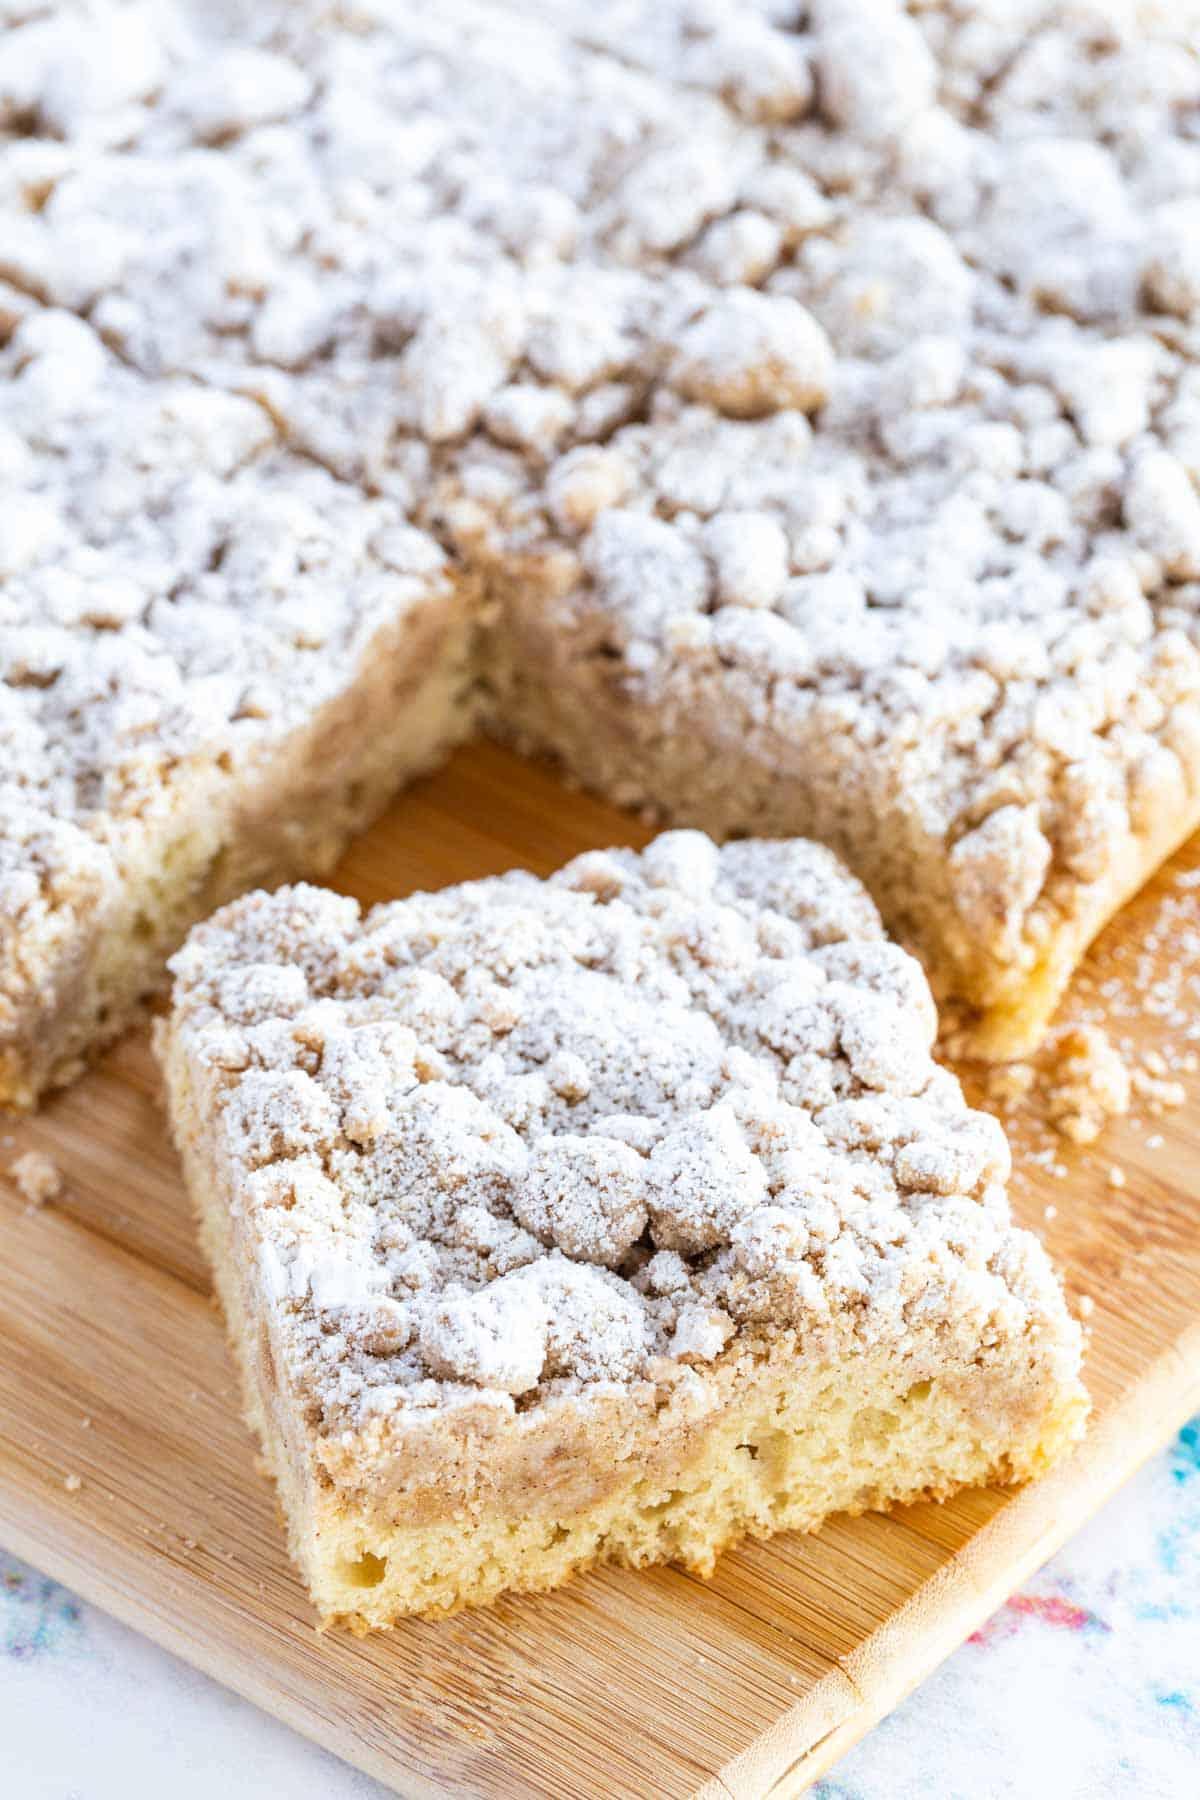 slice of gluten-free crumb cake on a wooden board